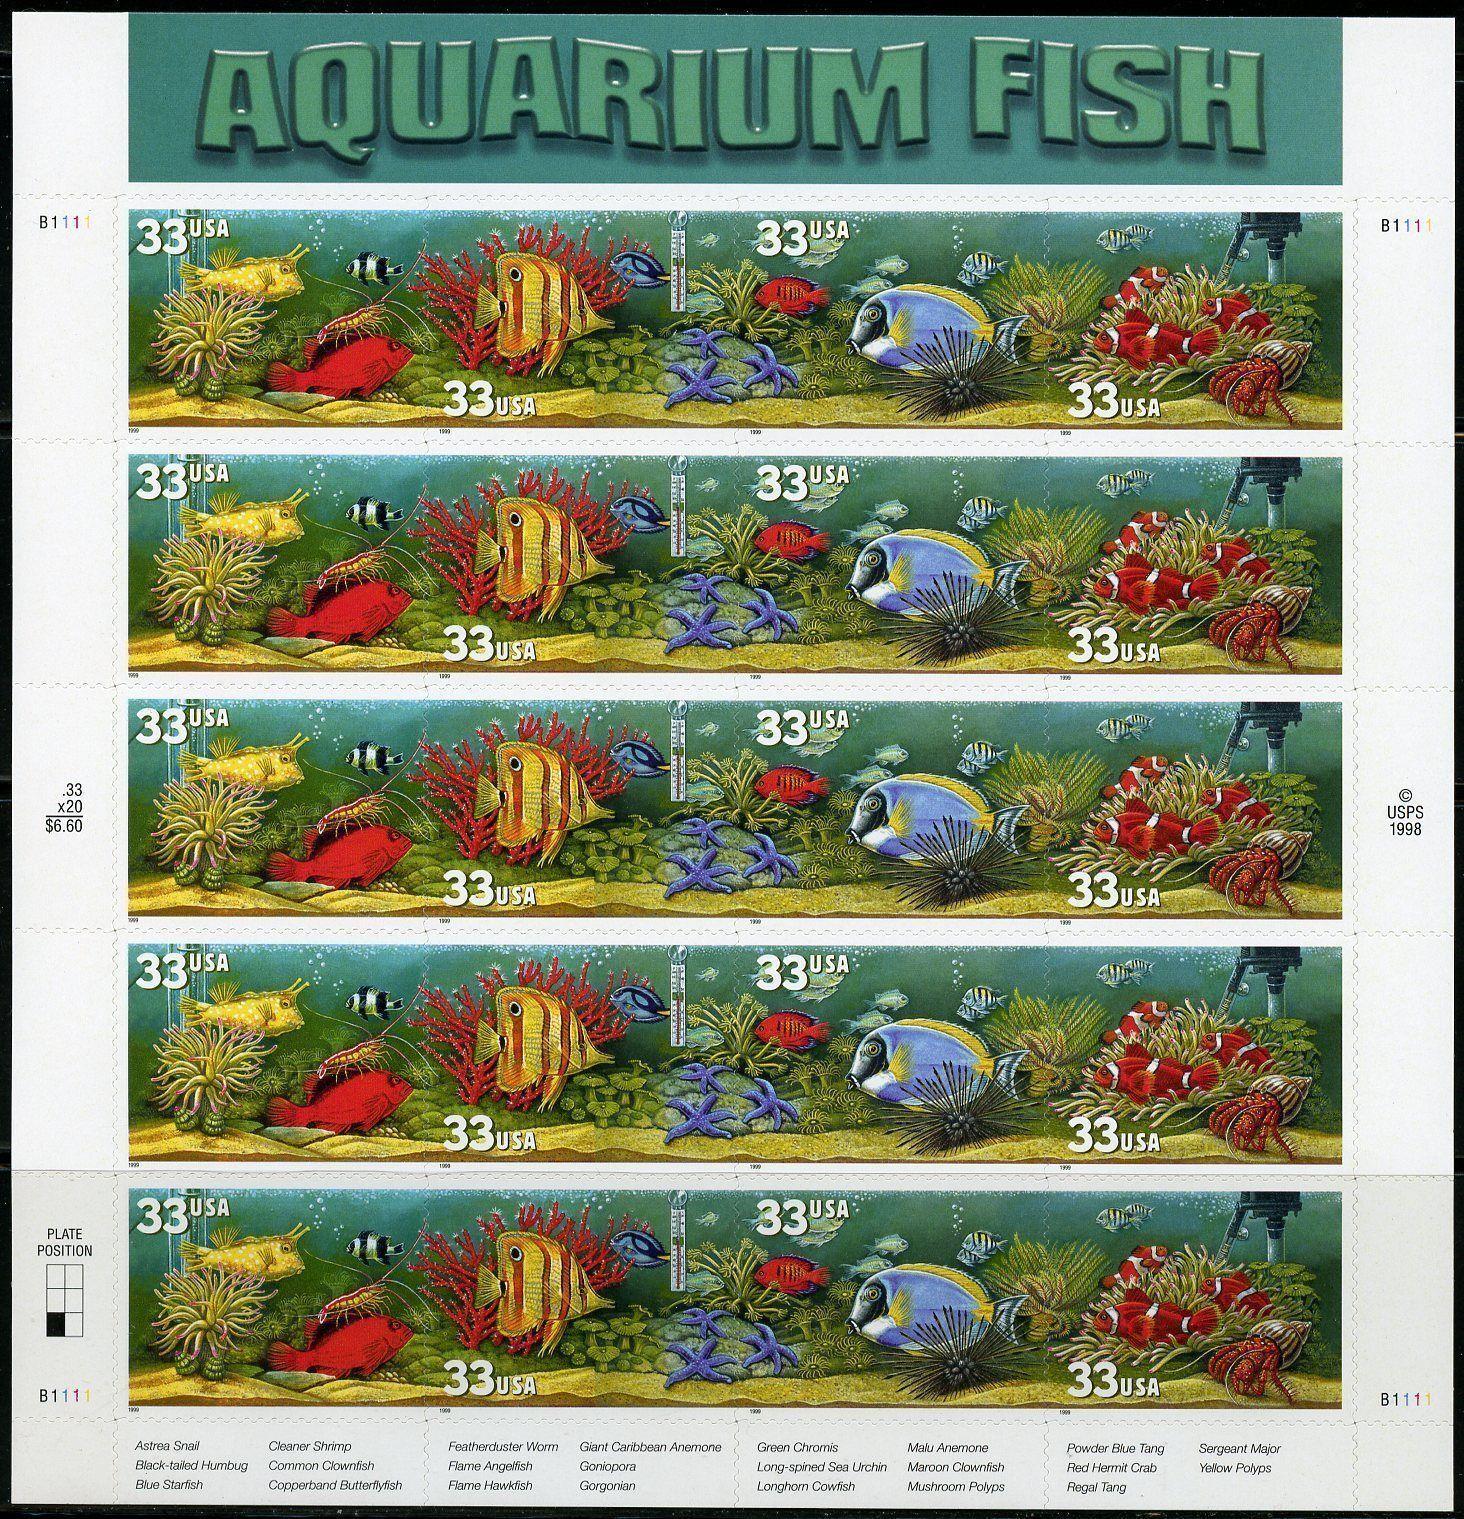 1999 33c Aquarium Fish, Sheet of 20 Scott 3317-20 Mint